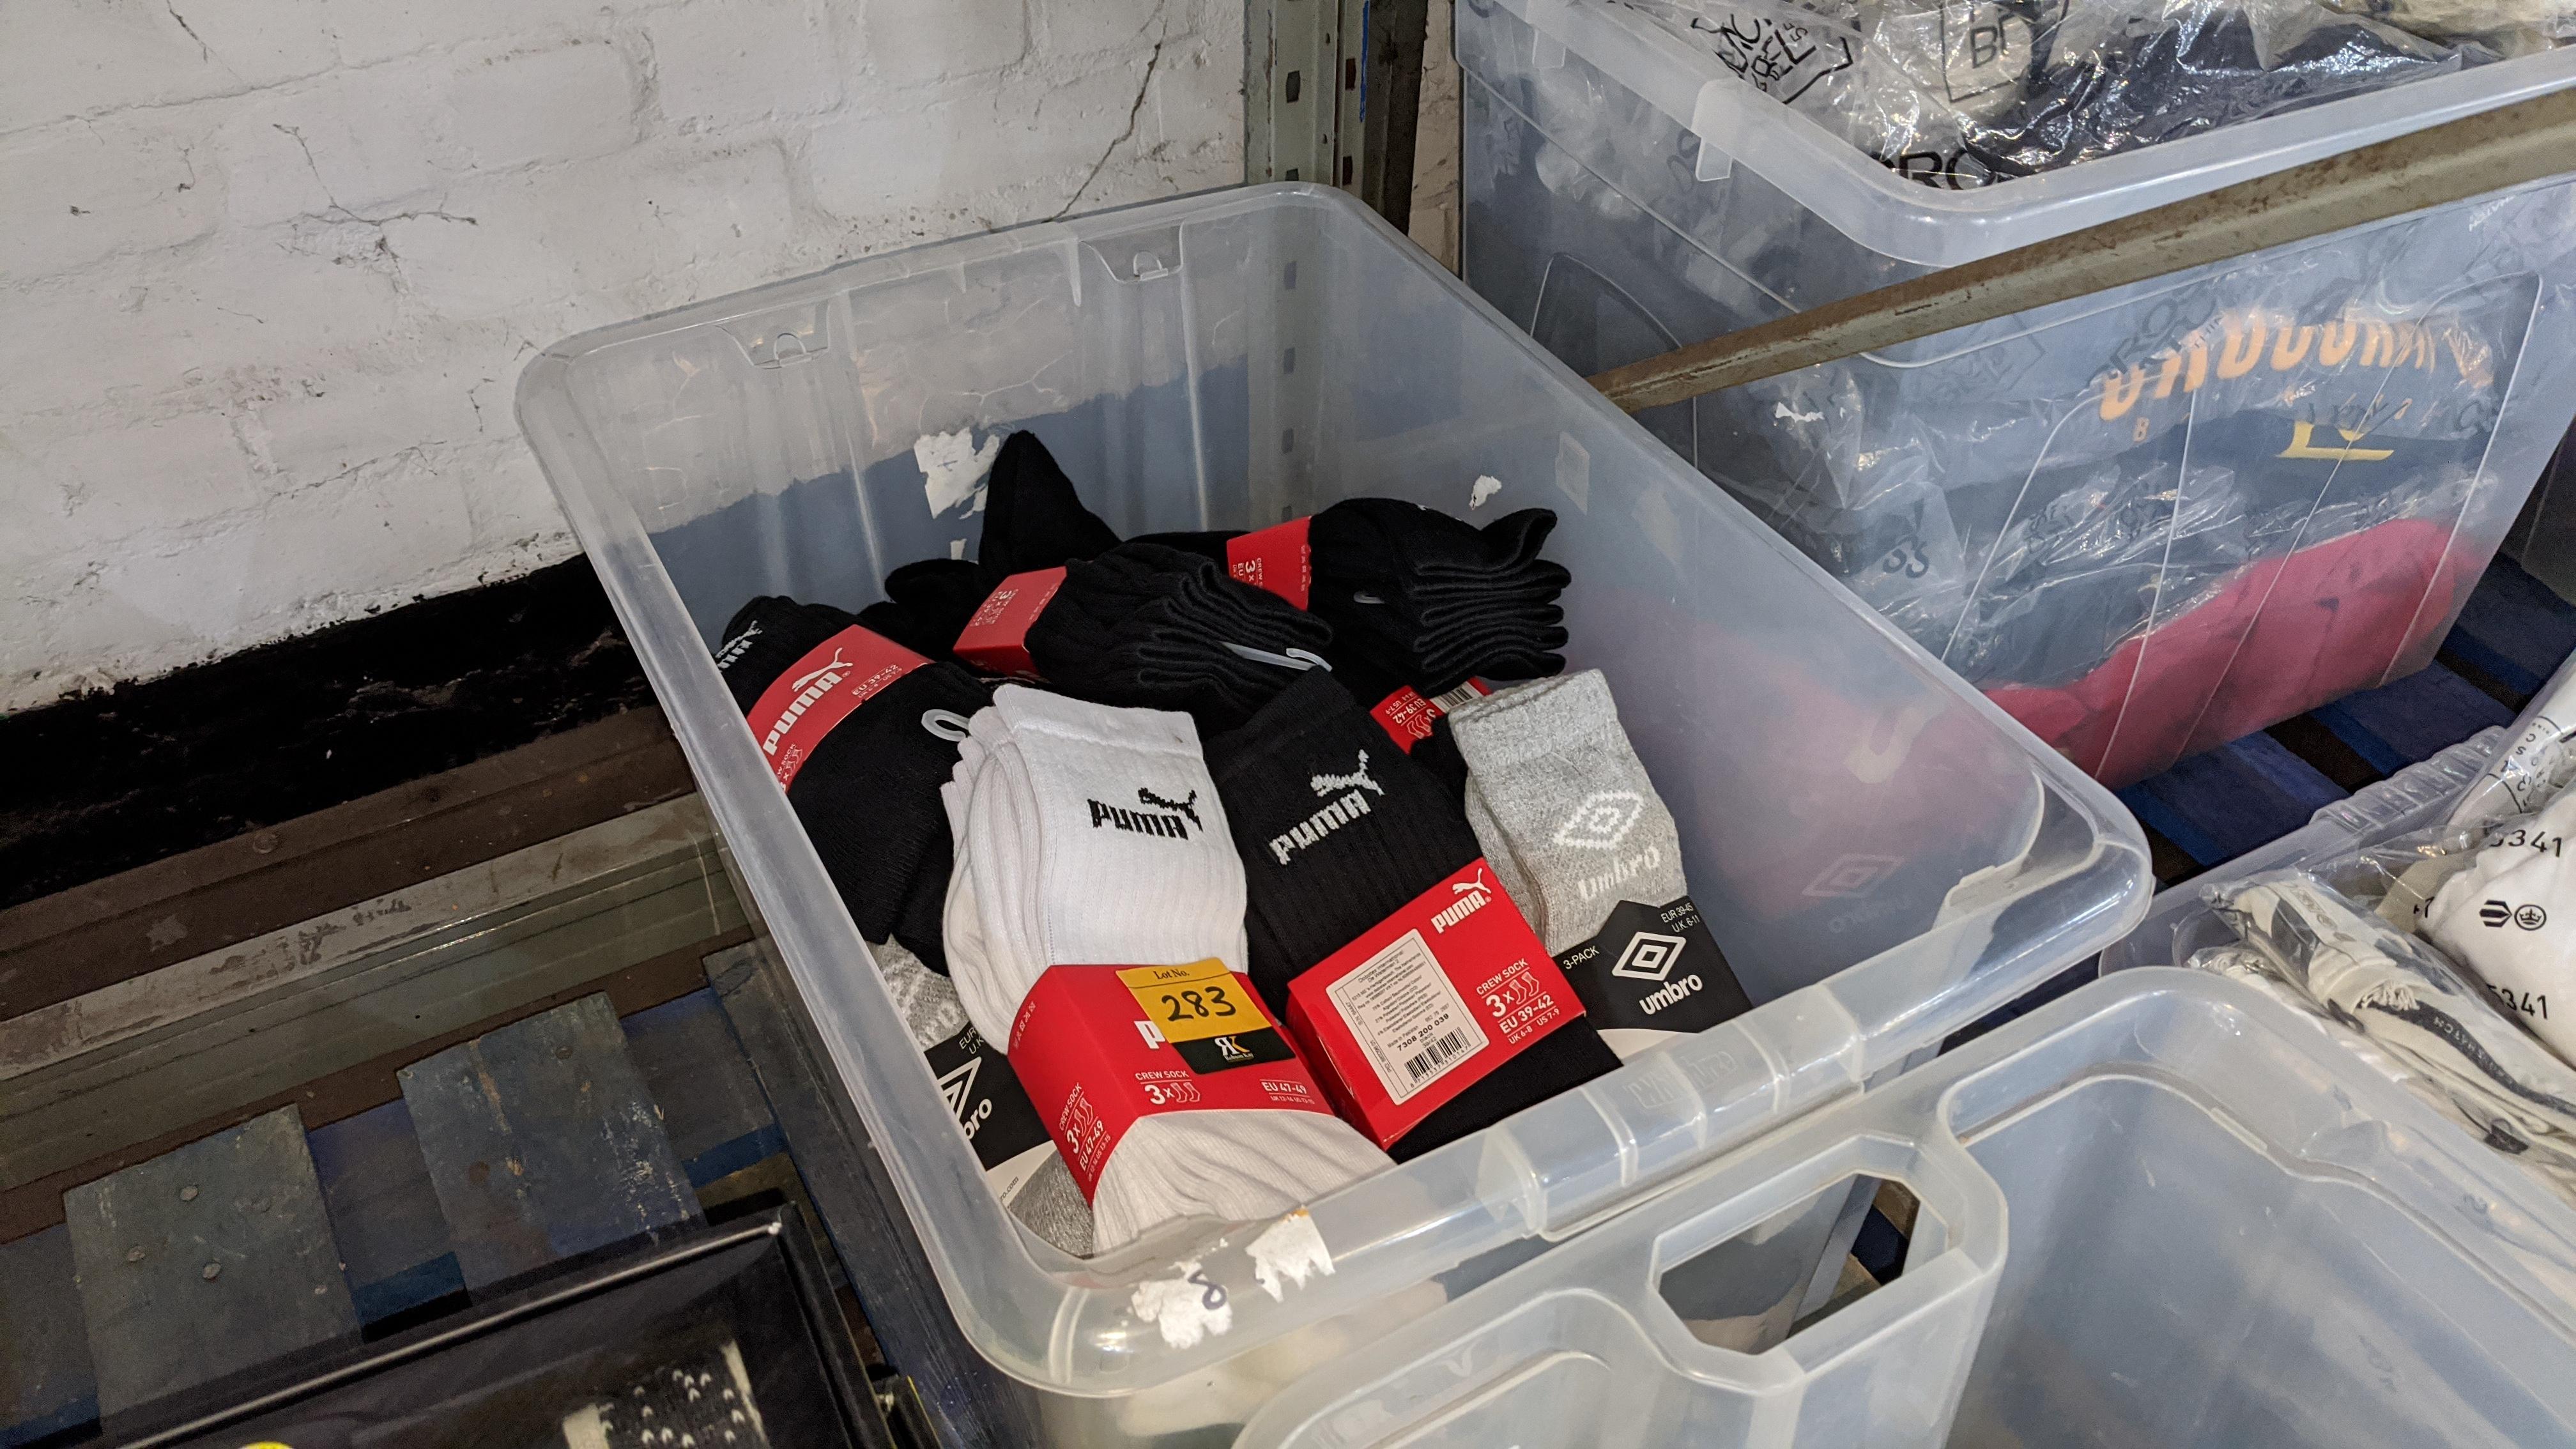 Very large quantity of primarily men's designer clothing & accessories. - Image 46 of 157